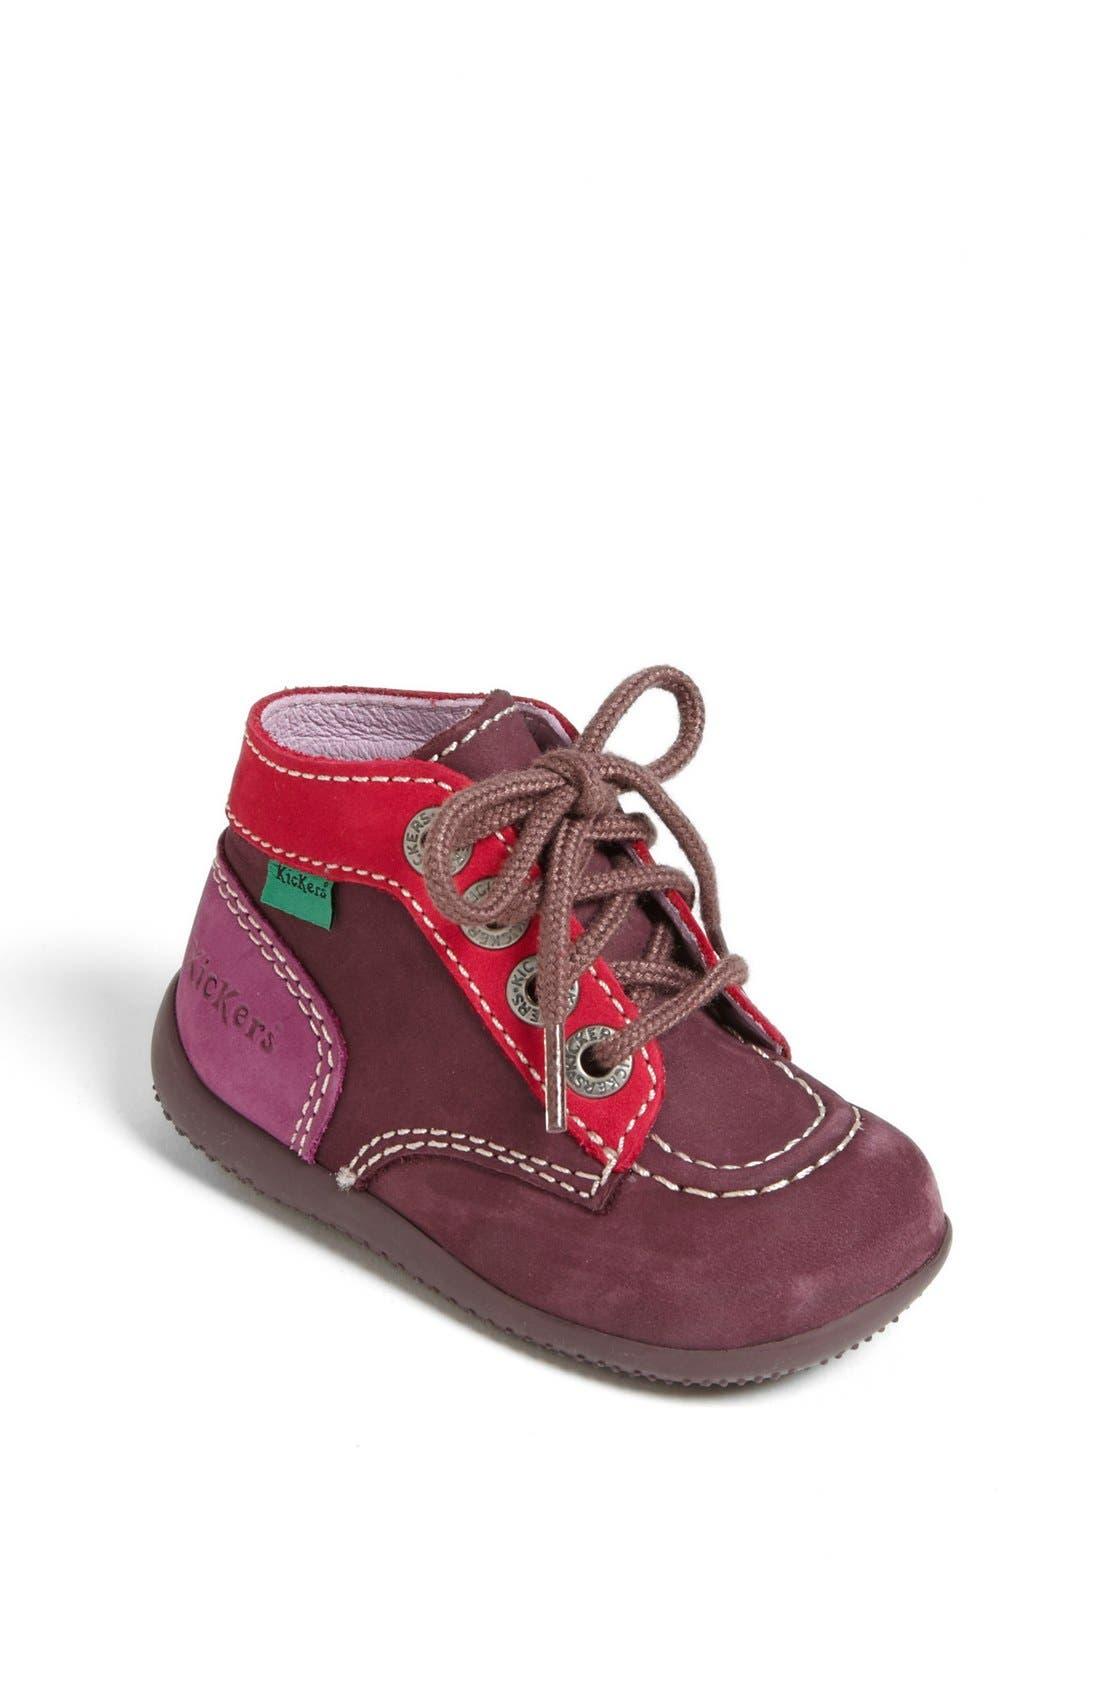 Alternate Image 1 Selected - Kickers 'Bonbon 82' Boot (Baby, Walker & Toddler)